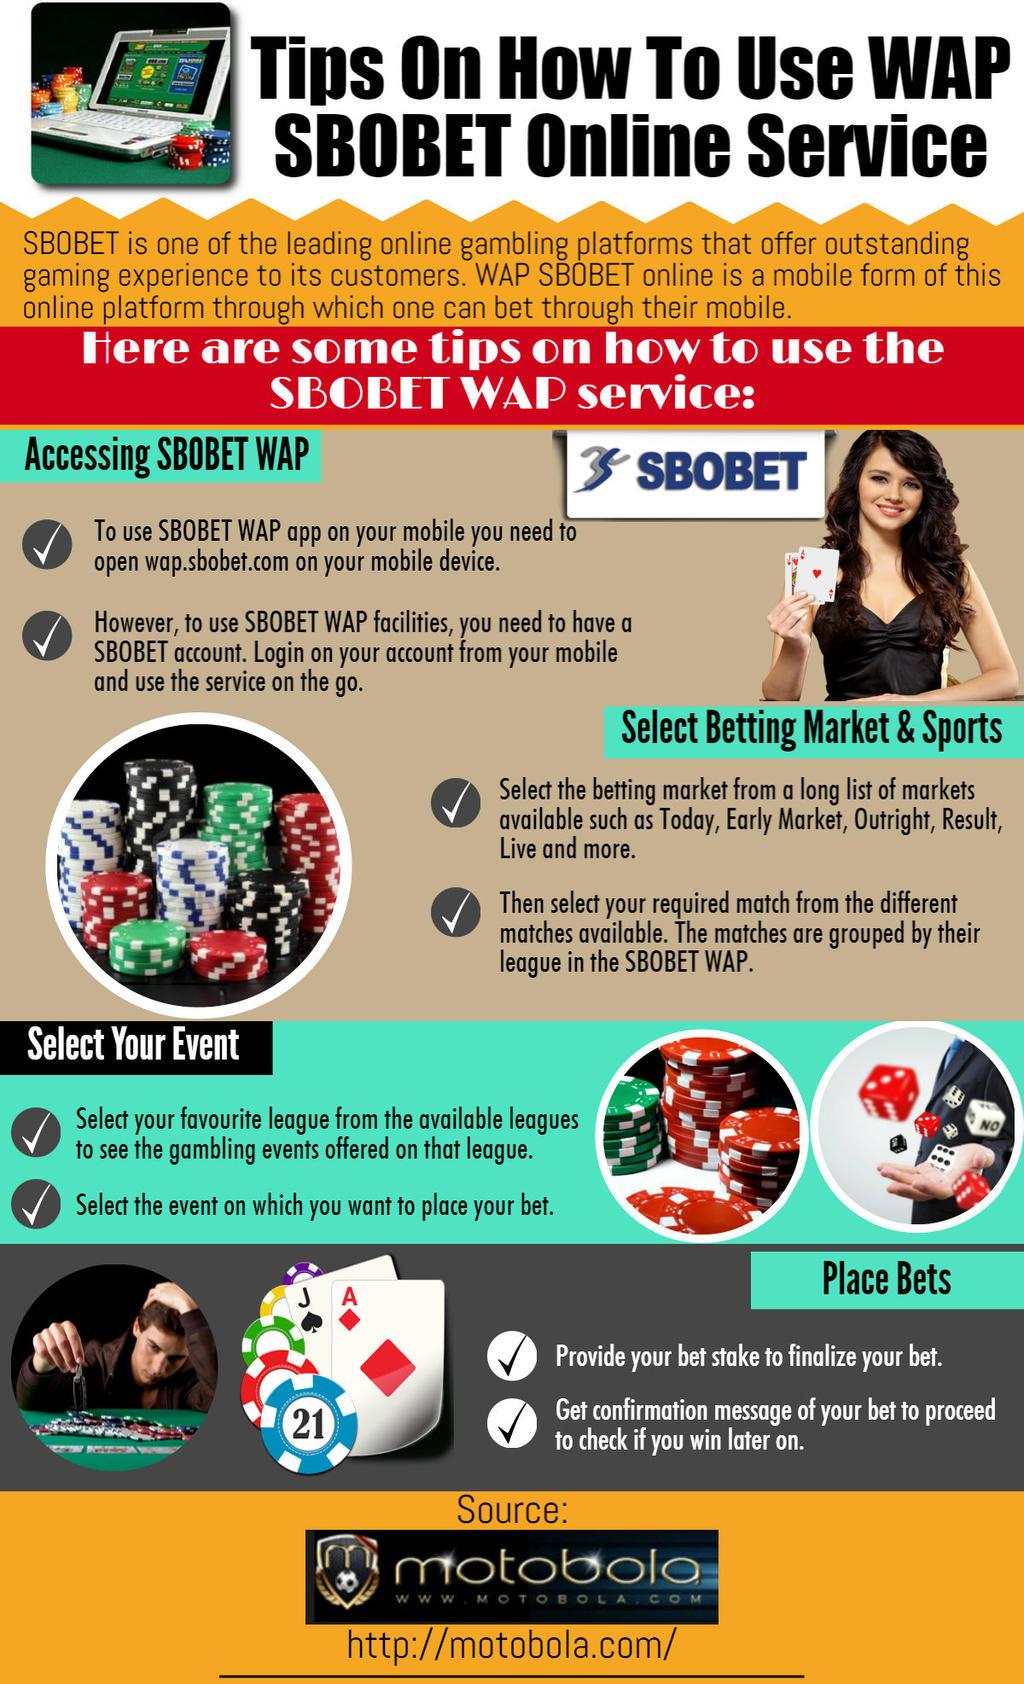 Why Agent SBOBET is Best As Online Gambling Agent by Juangonzalezs on DeviantArt